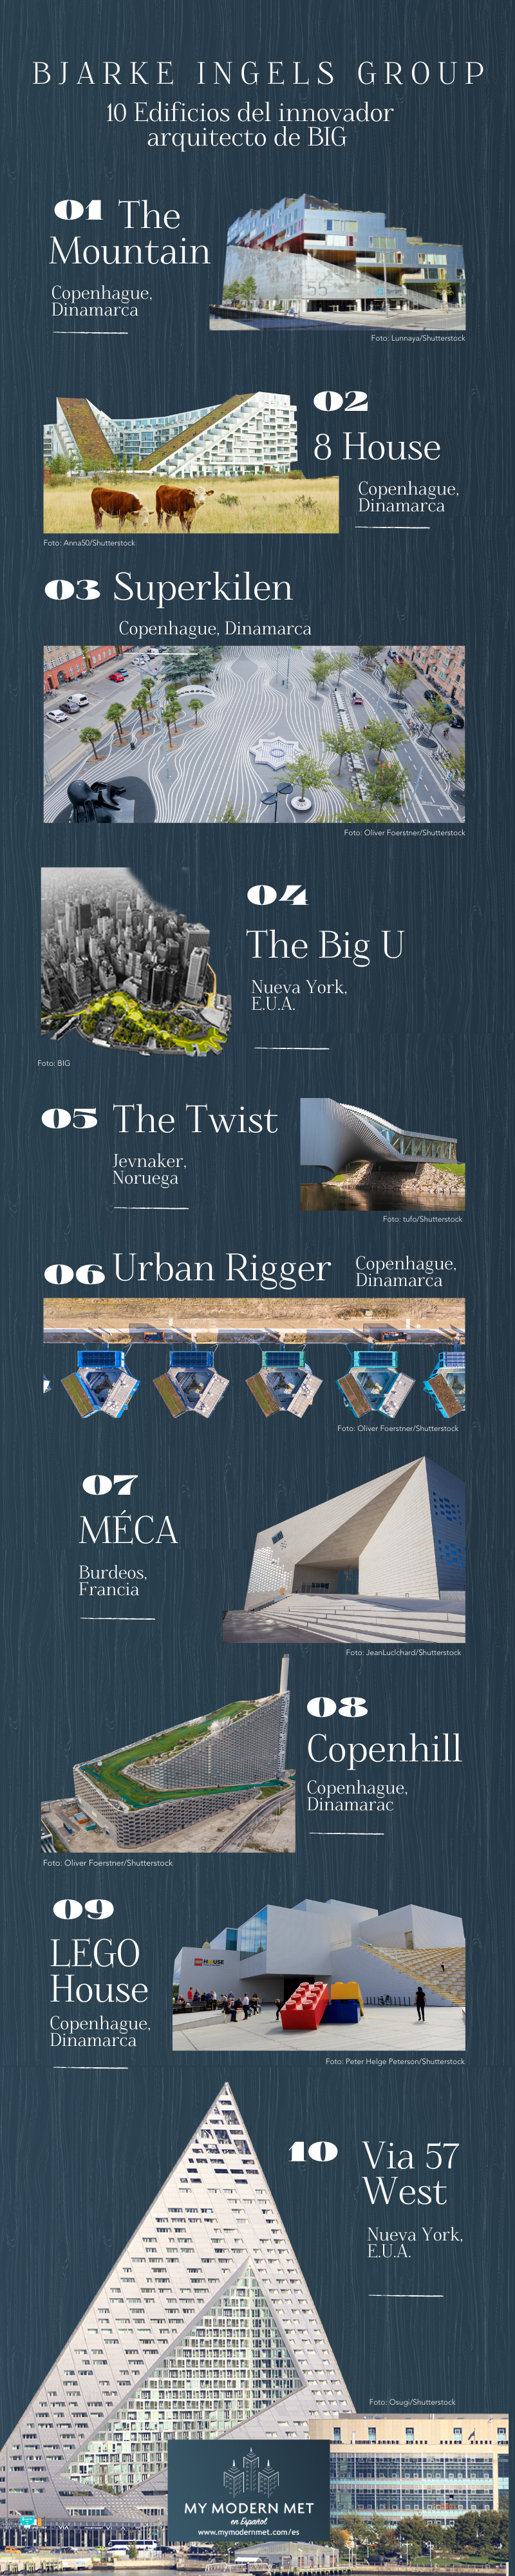 Infografía de edificios de Bjarke Ingels Group